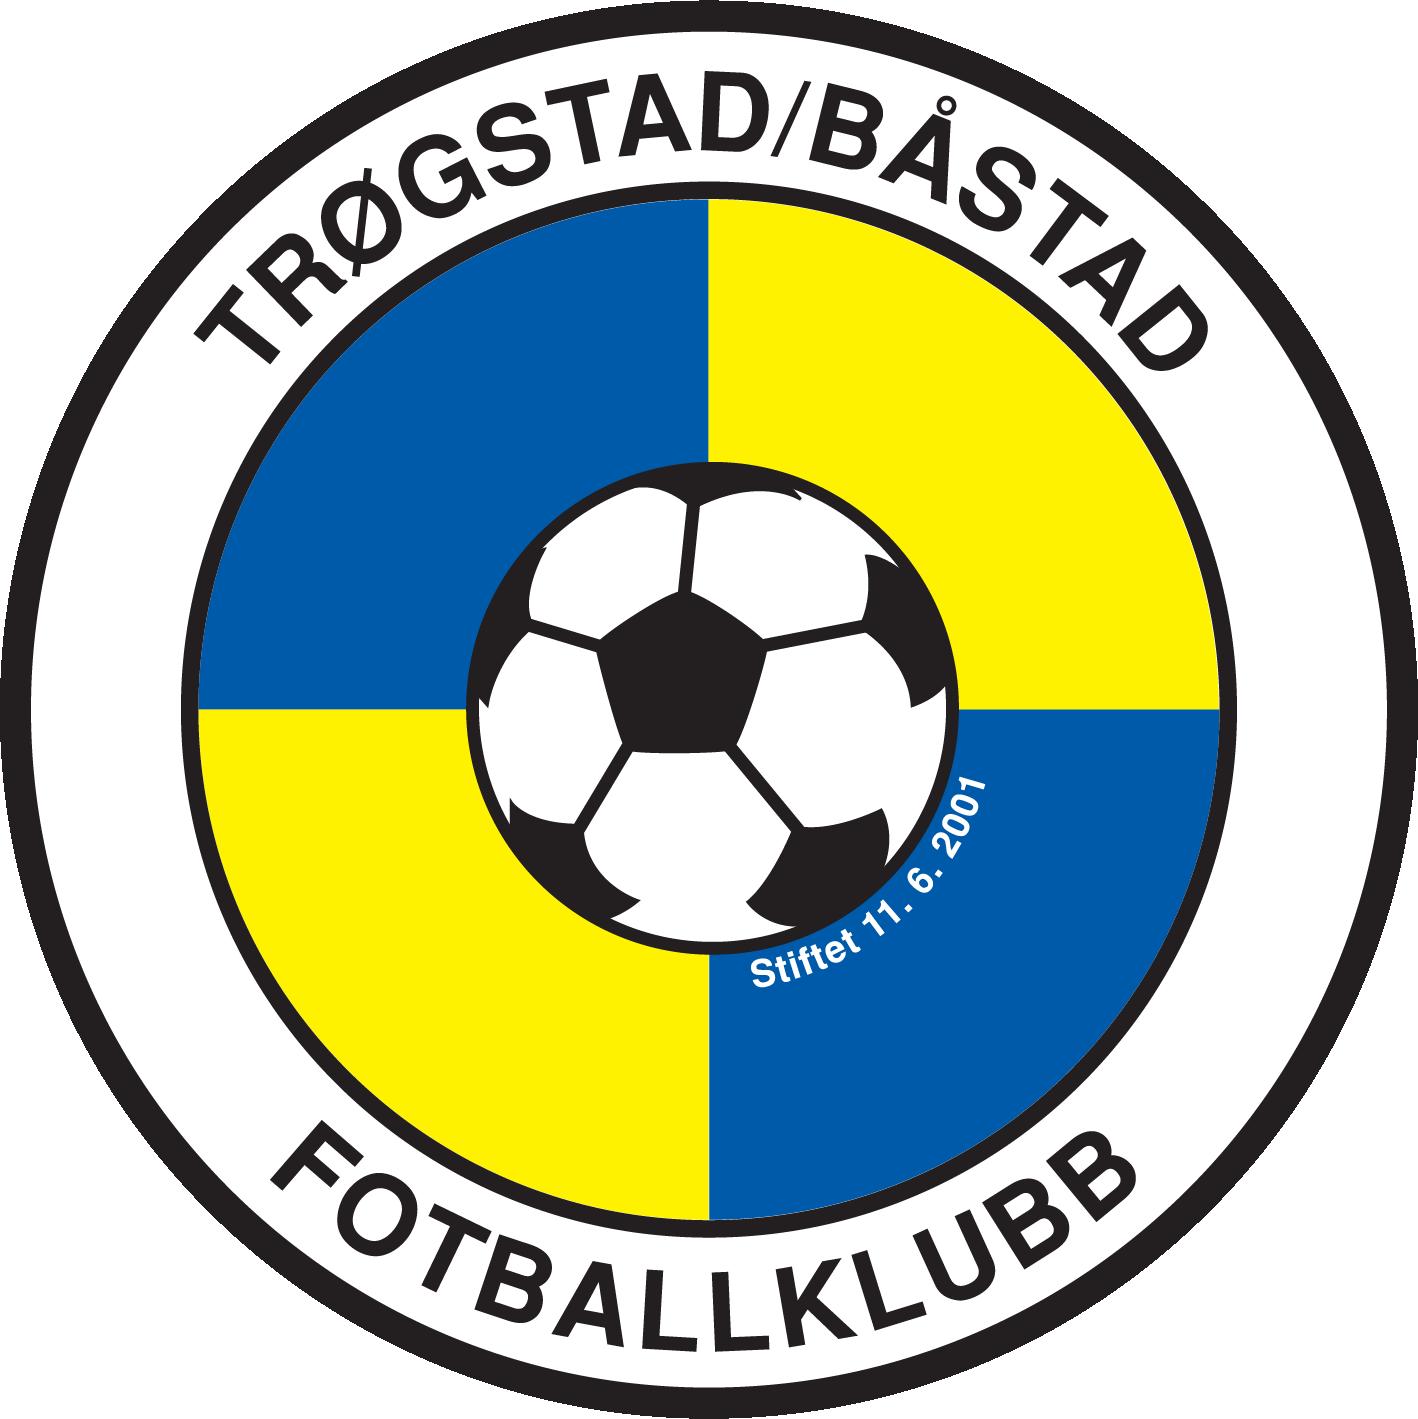 Trøgstad/Båstad Fotballklubb